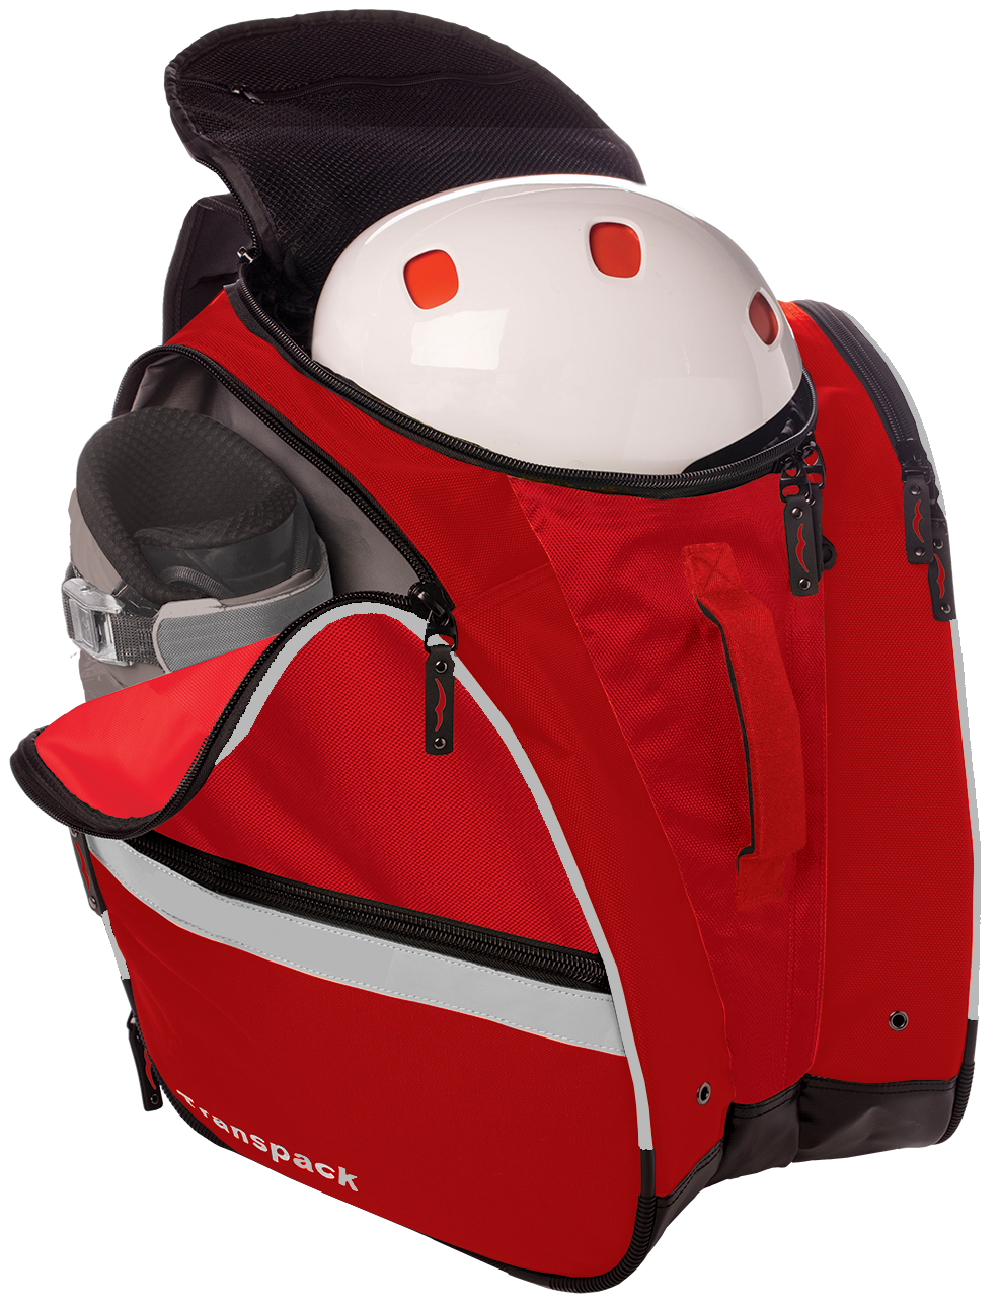 Store helmet, goggles & gear inside